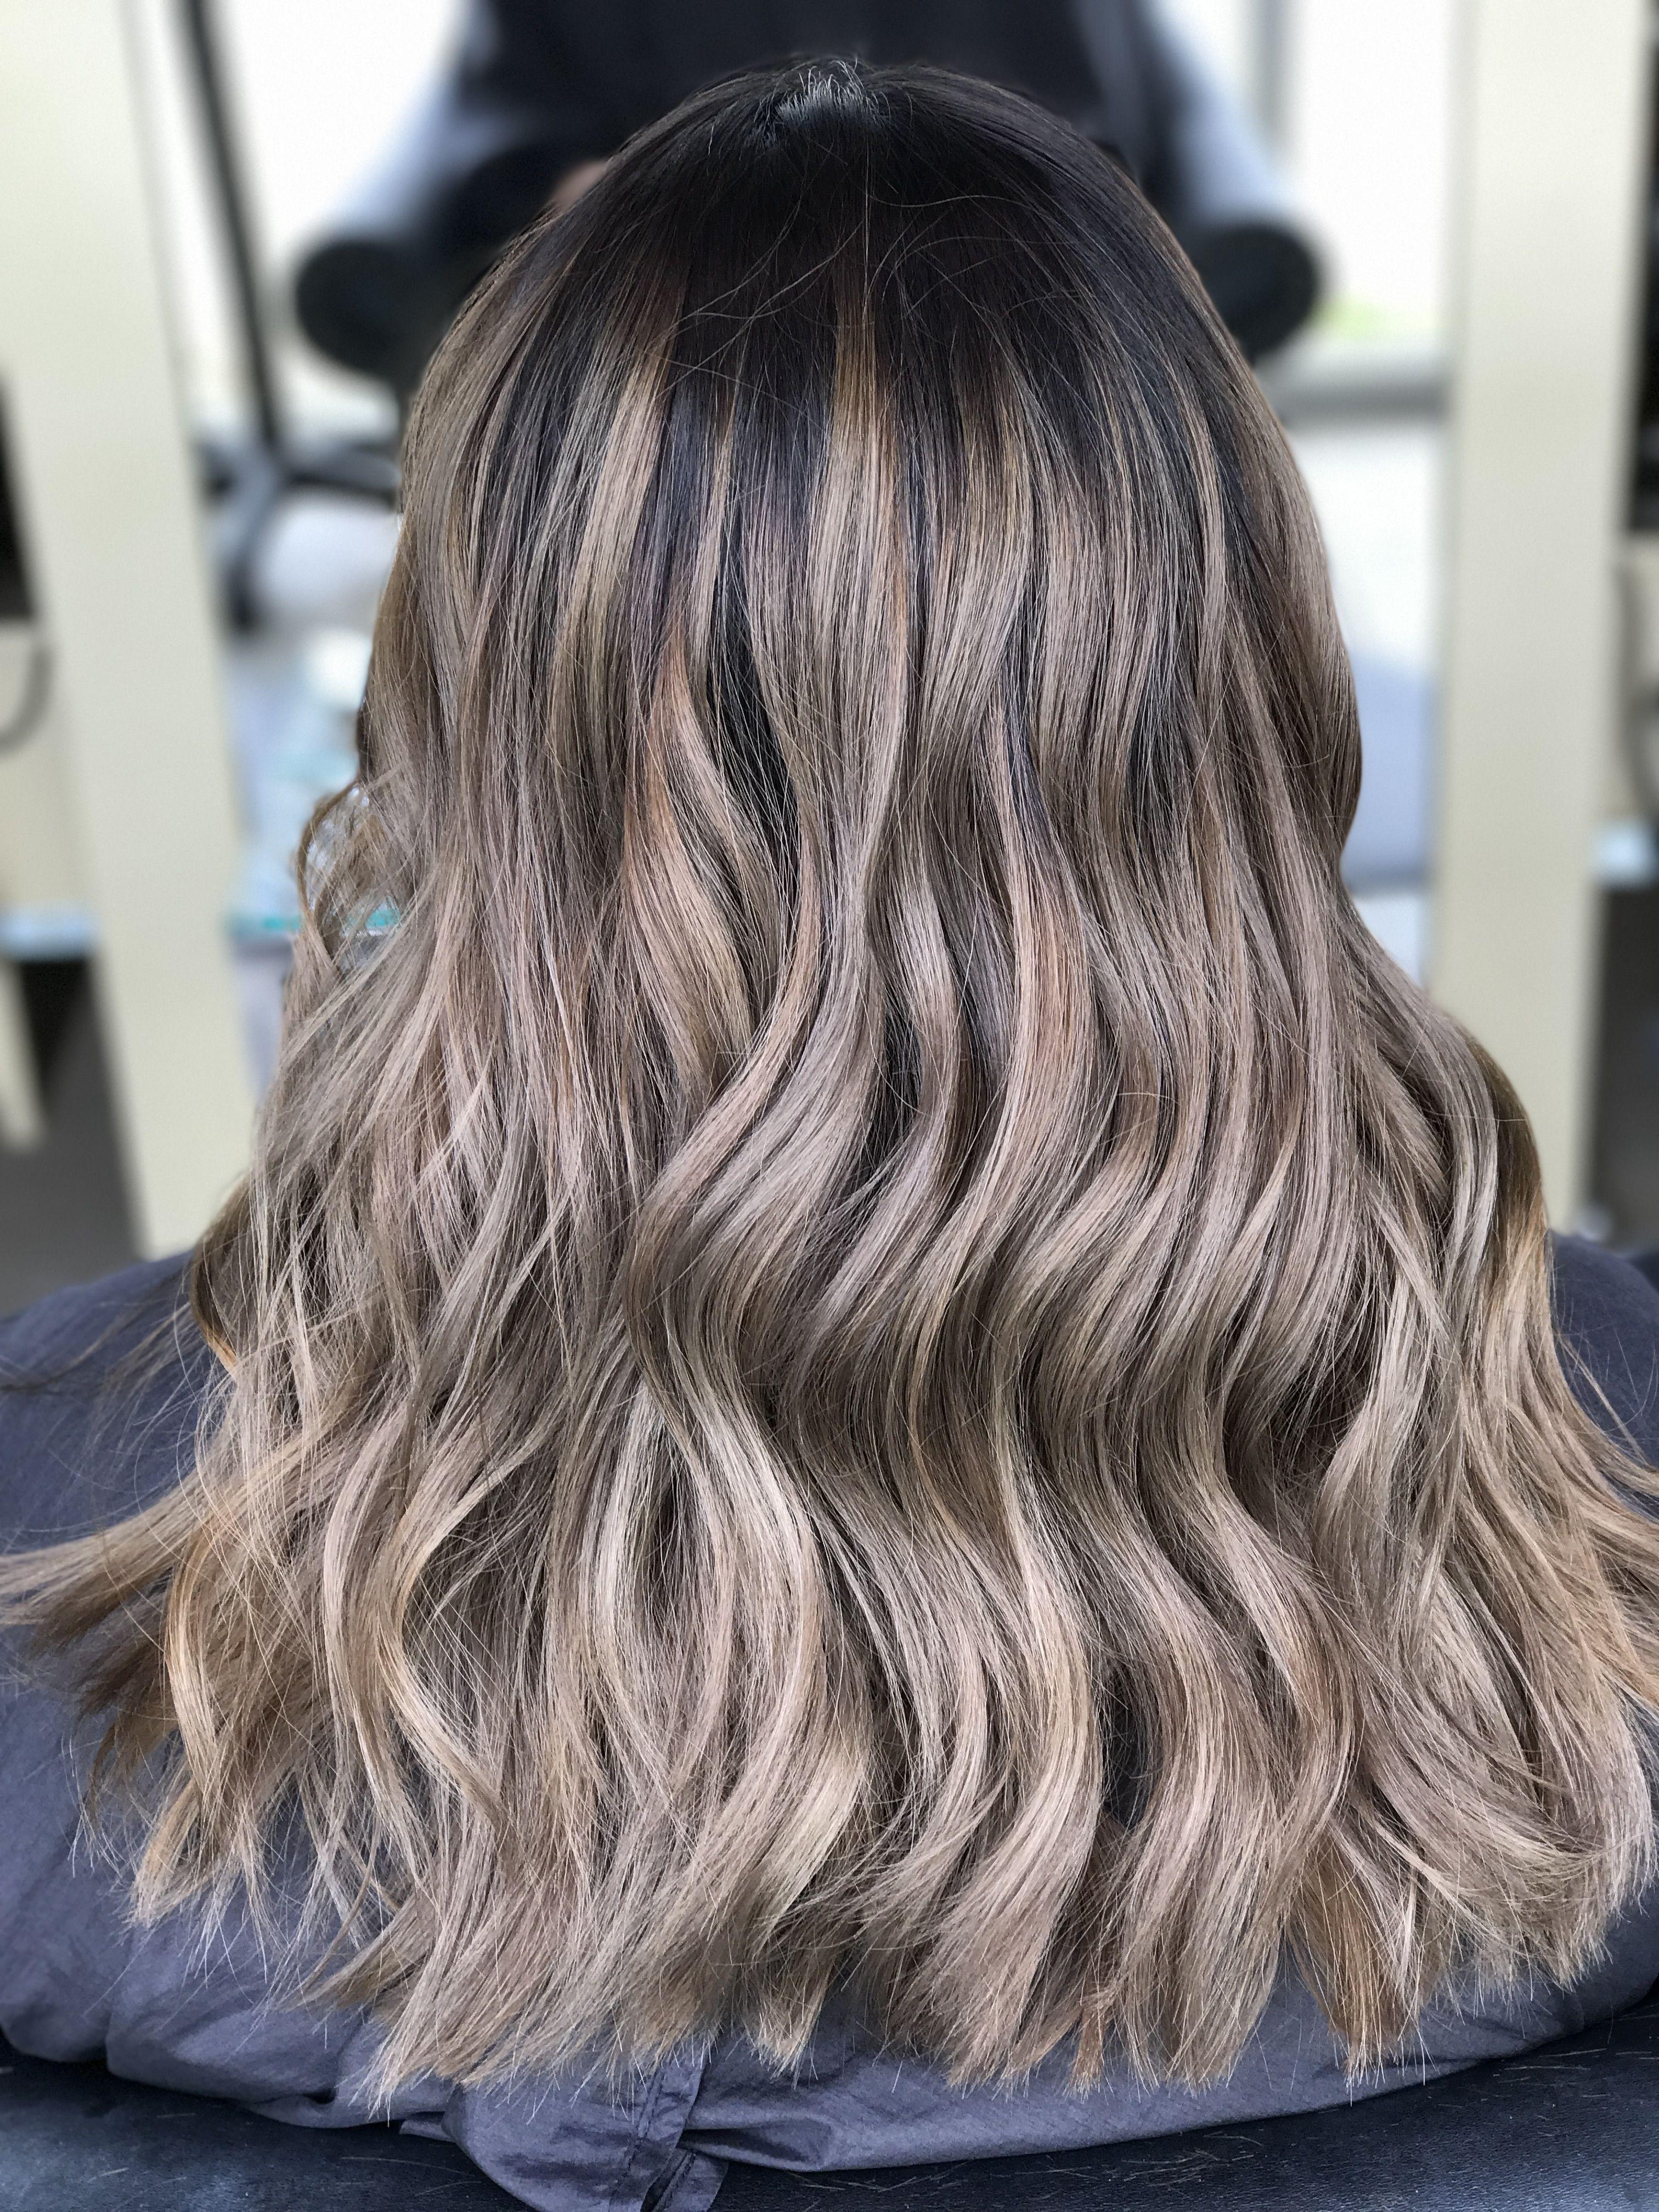 Cool Ashy Brown Hair Color For Fall Hair Pinterest Ashy Brown